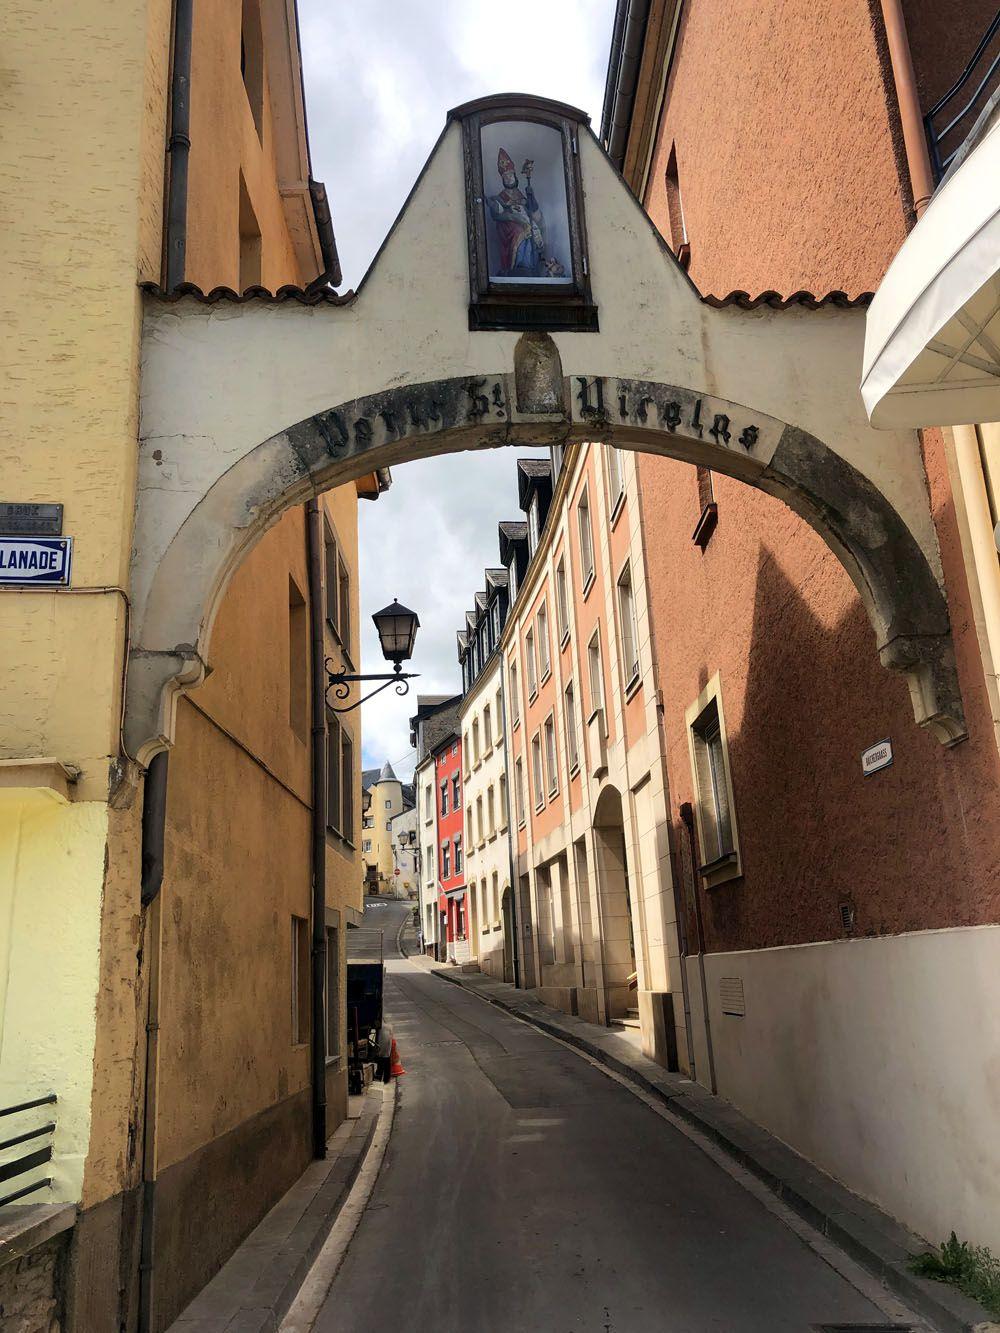 Week-End en Moselle... Remich et Schengen au Luxembourg